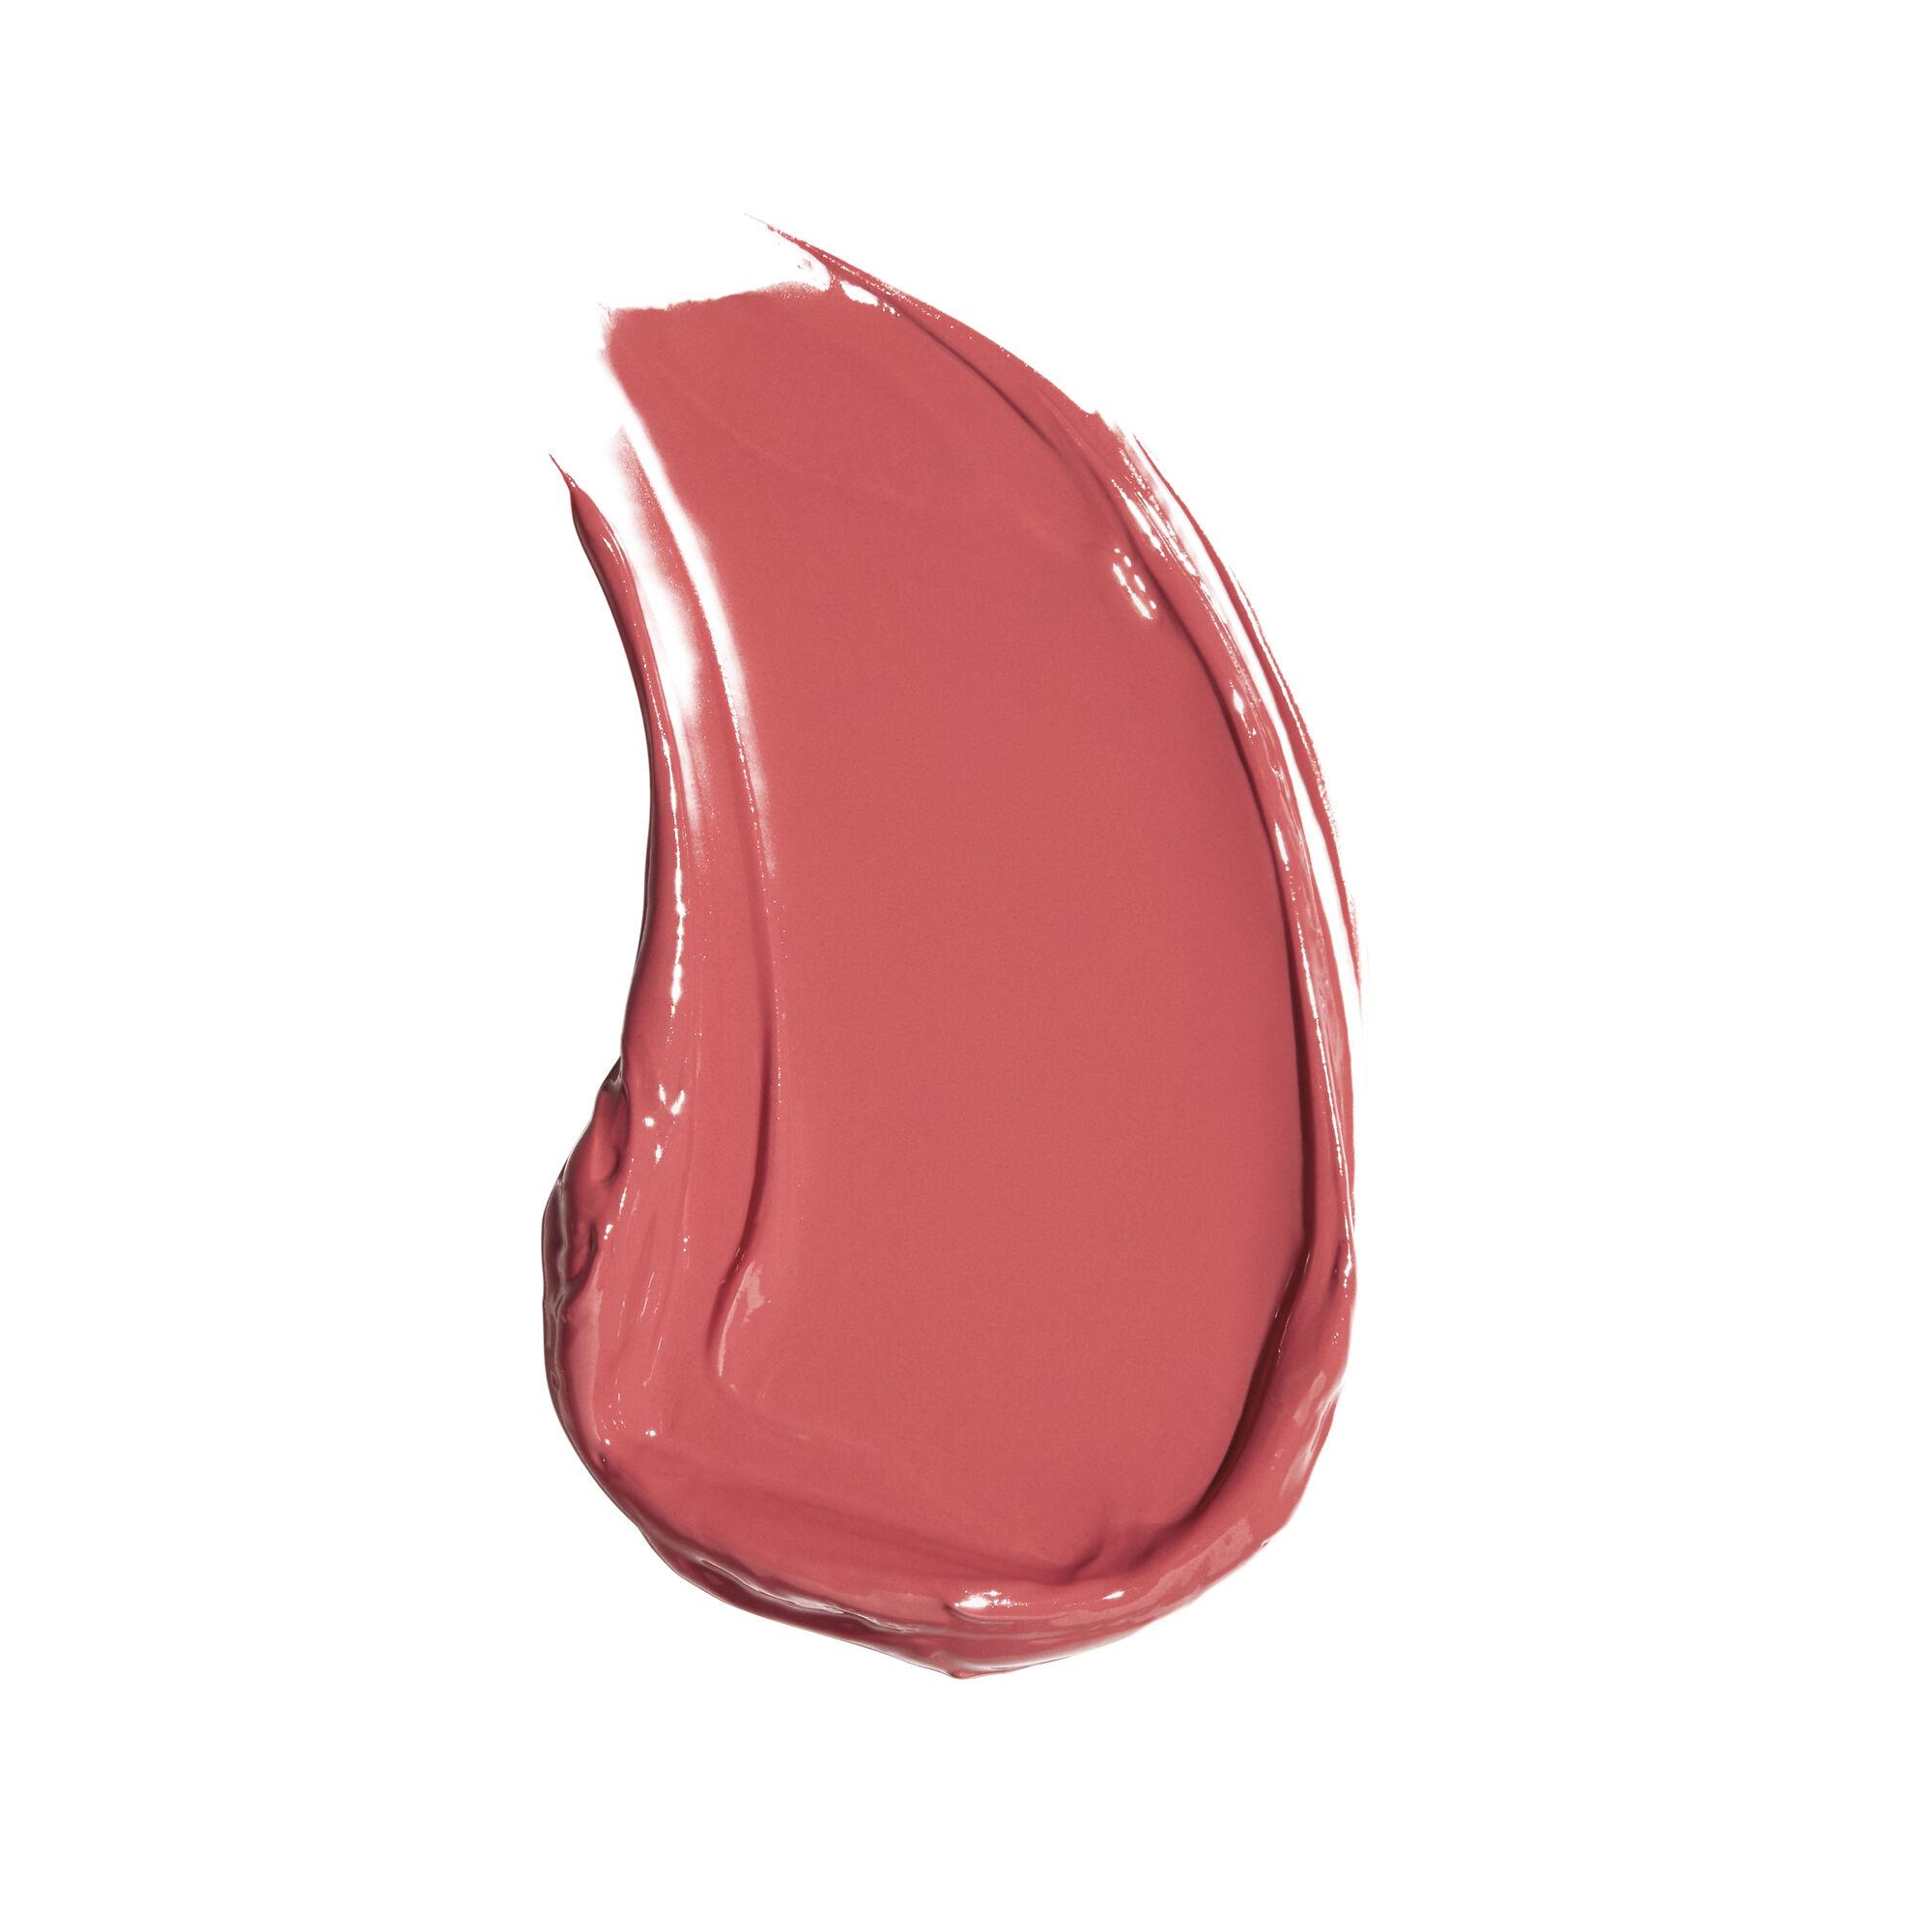 Liquid Lipstick, Happiness